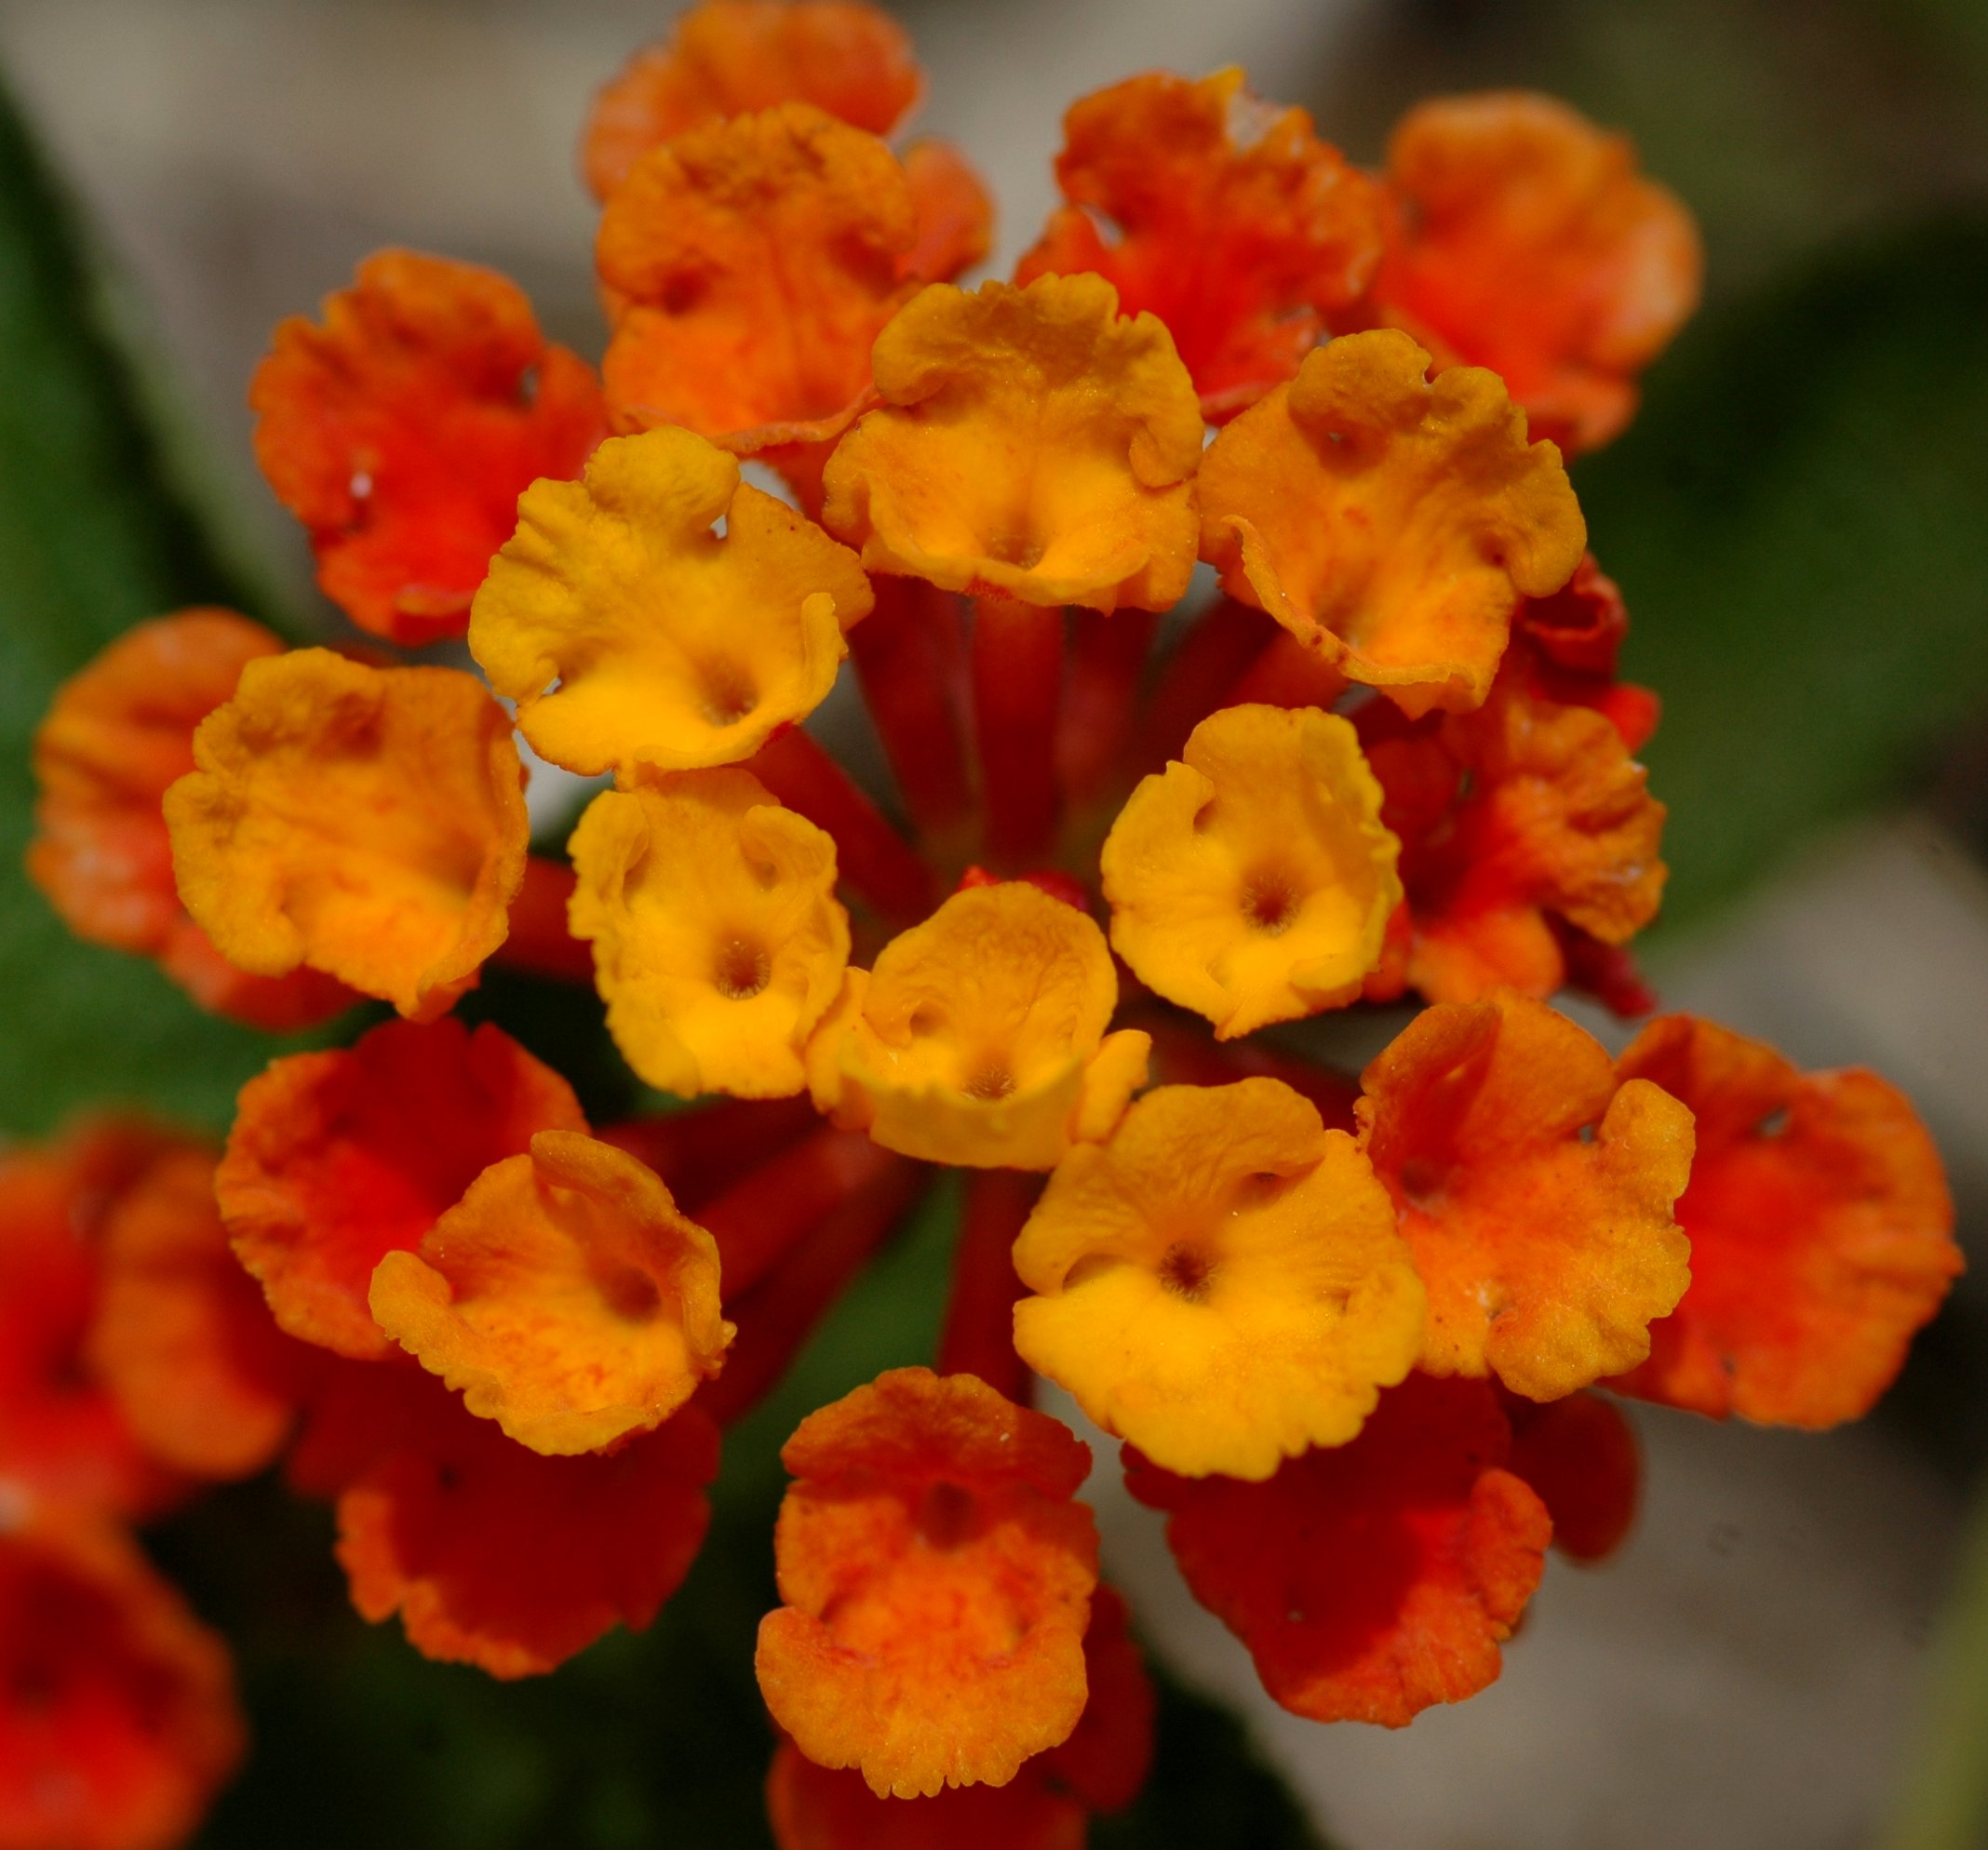 20070606 5373 Yellow And Orange Flowers